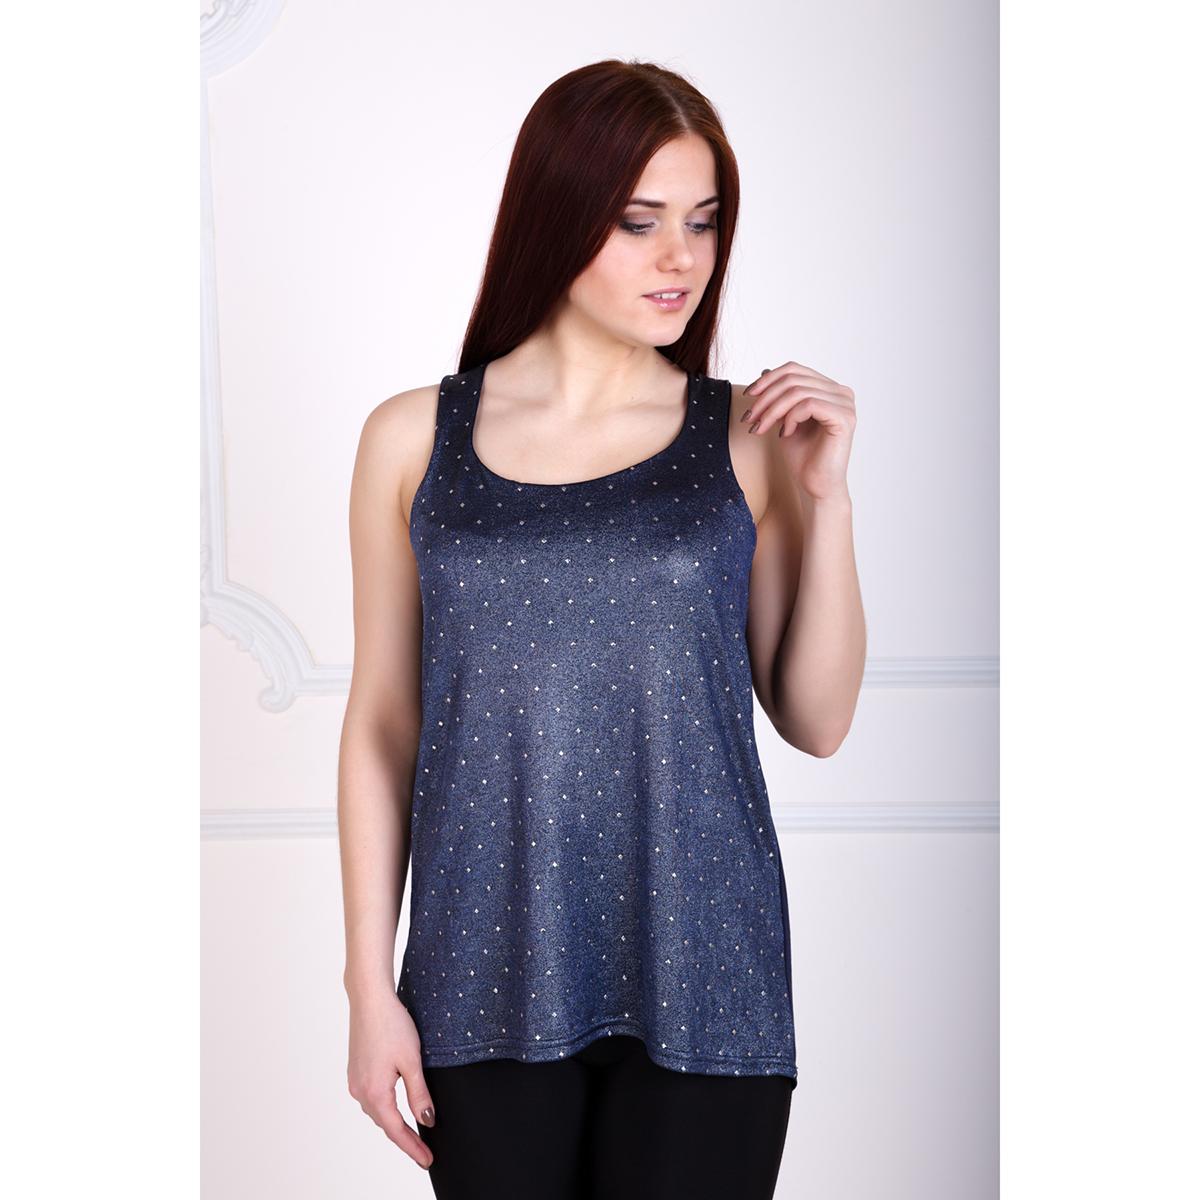 Женская майка Инес Синий, размер 44Майки и футболки<br>Обхват груди: 88 см <br>Обхват талии: 68 см <br>Обхват бедер: 96 см <br>Рост: 167 см<br><br>Тип: Жен. футболка<br>Размер: 44<br>Материал: Вискоза